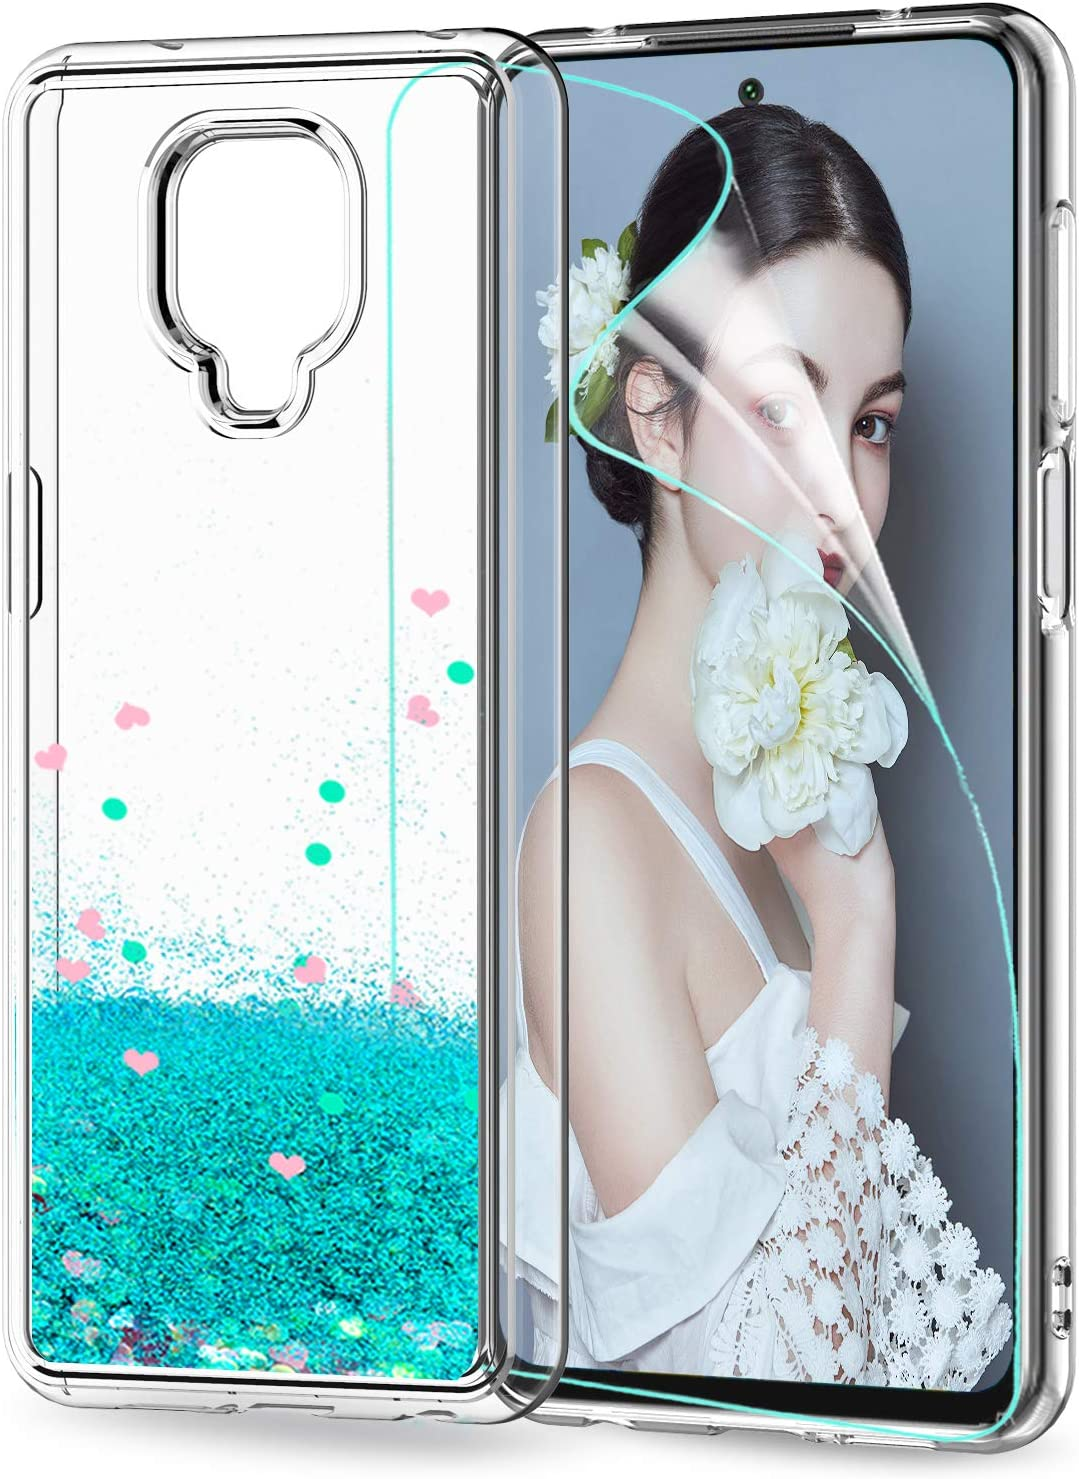 LeYi Funda Xiaomi Redmi Note 9S / Note 9 Pro Silicona Purpurina Carcasa con HD Protector de Pantalla, Transparente Cristal Bumper Telefono TPU Case Cover para Movil Note 9S Verde